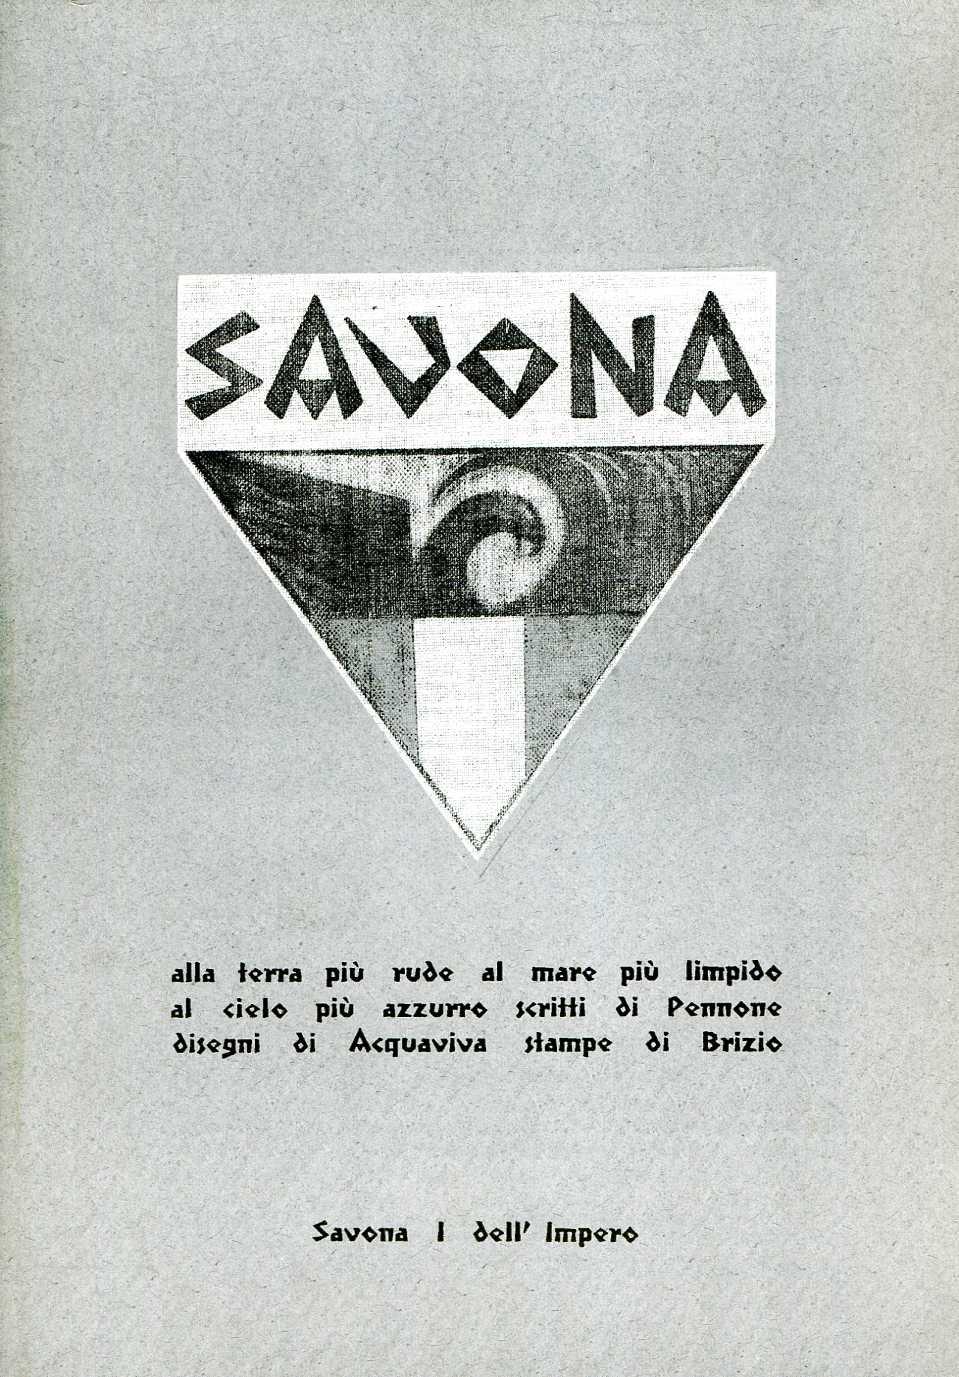 Savona (Pennone - Acquaviva - Brizio)